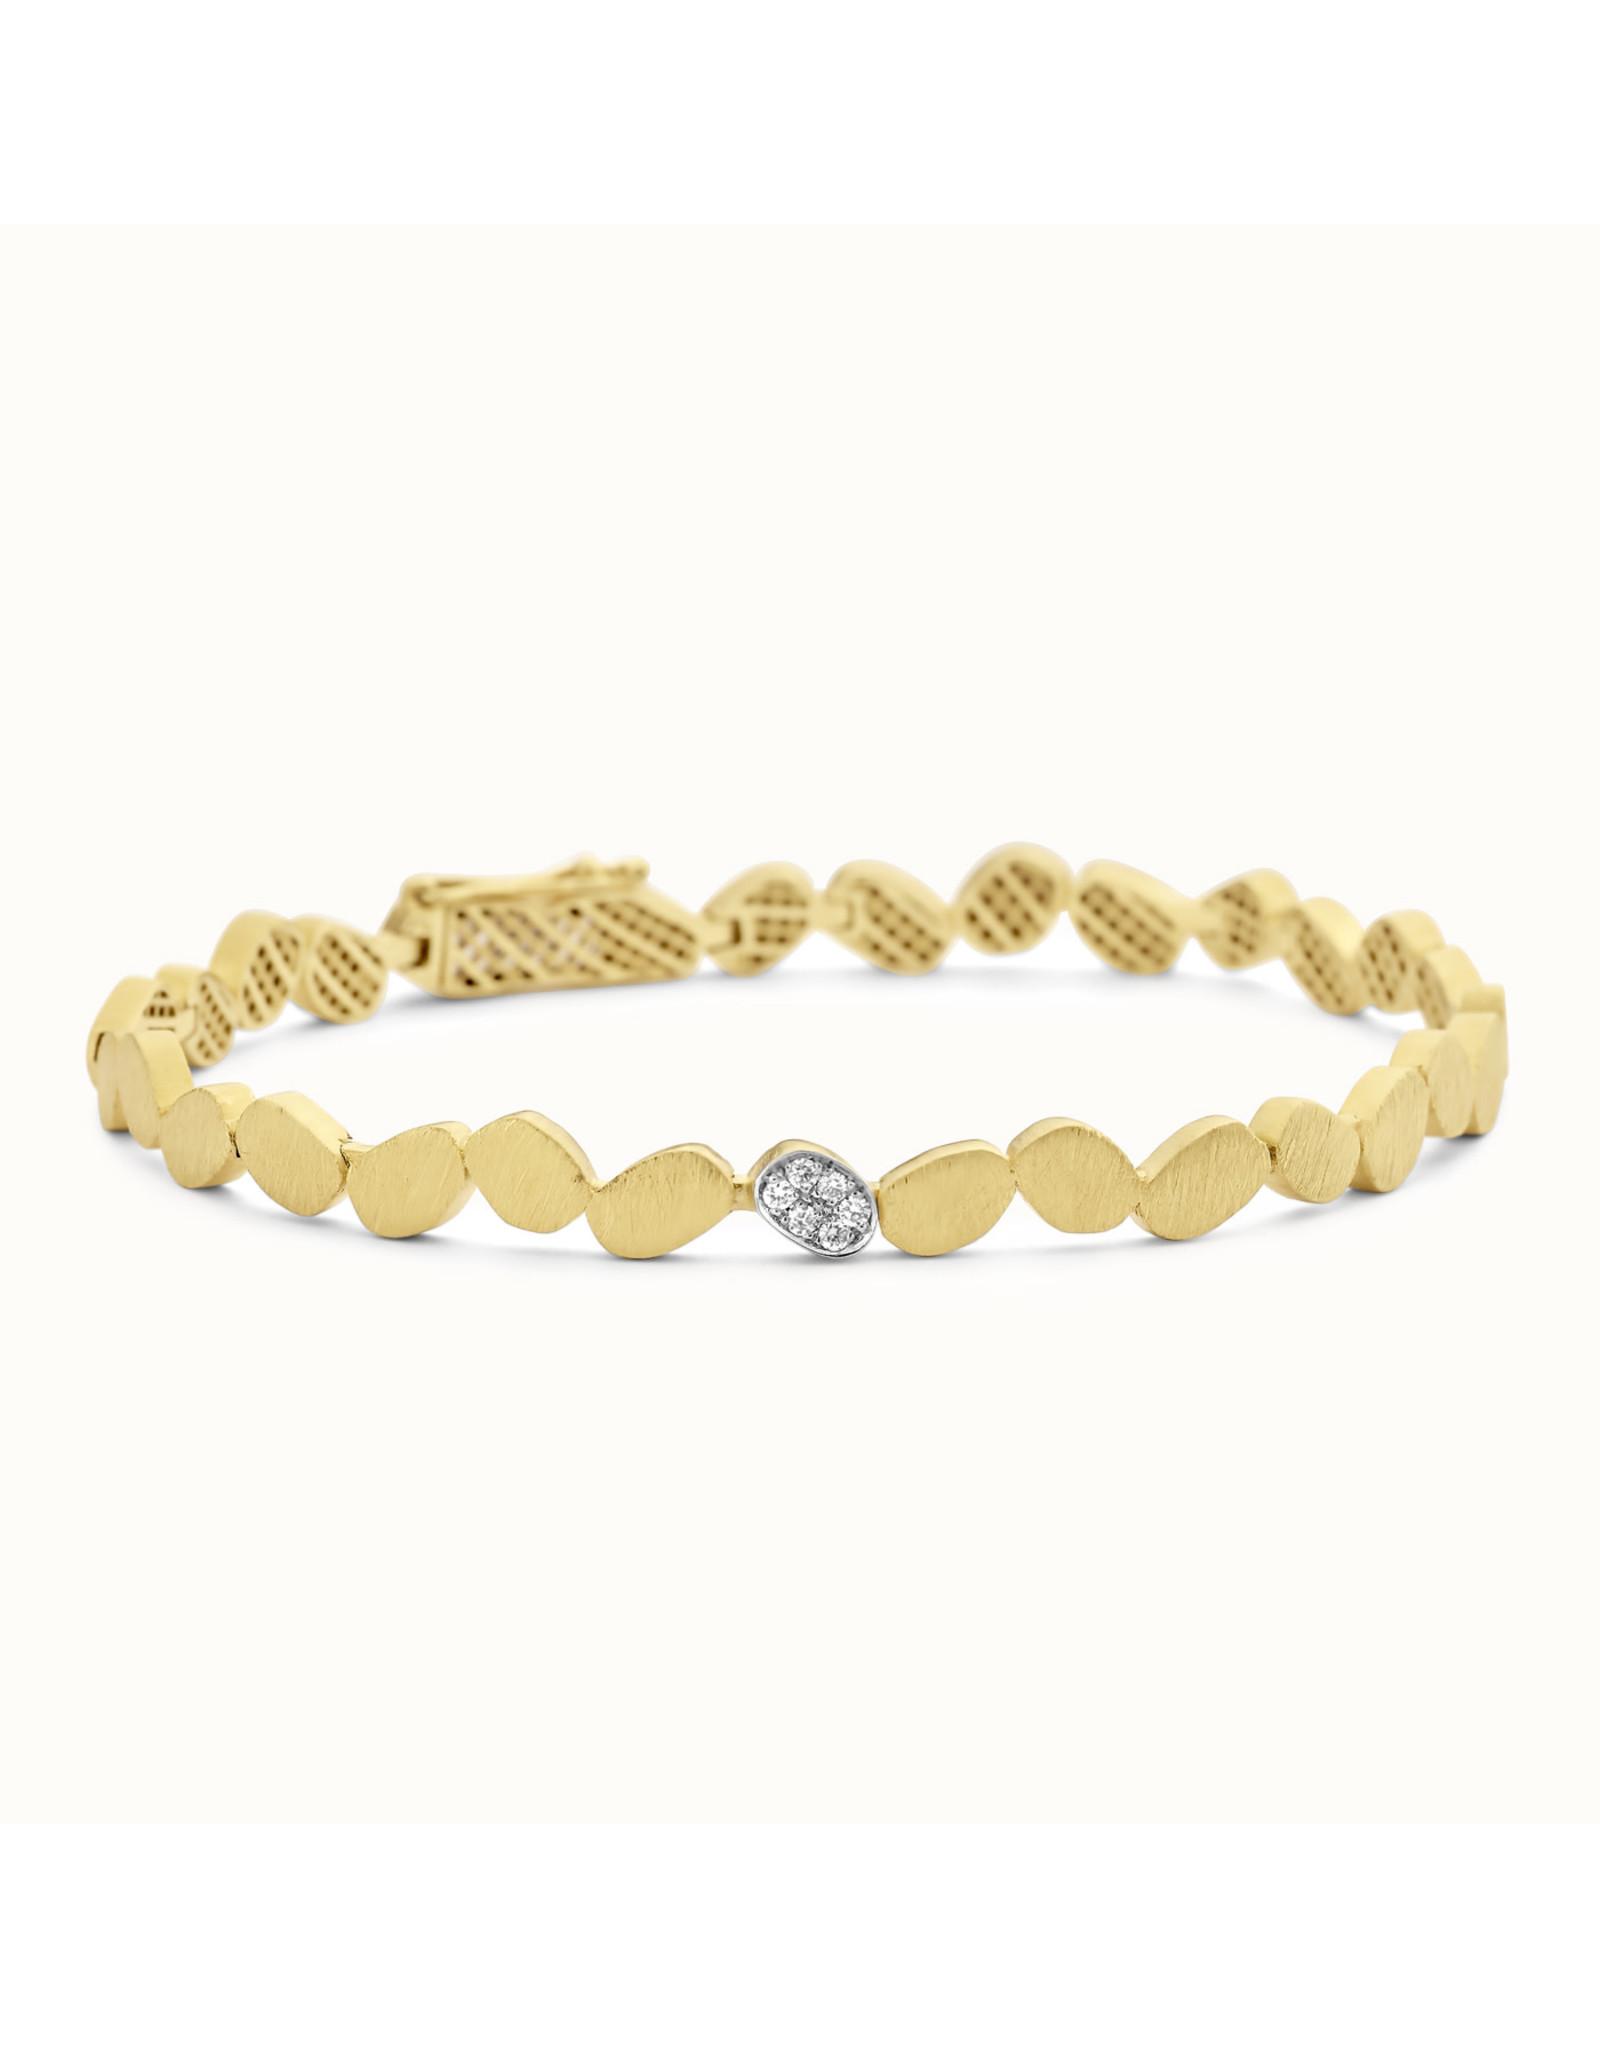 Femme adoree Armband Geel Goud 18kt 03A0301 Diamant 6pt